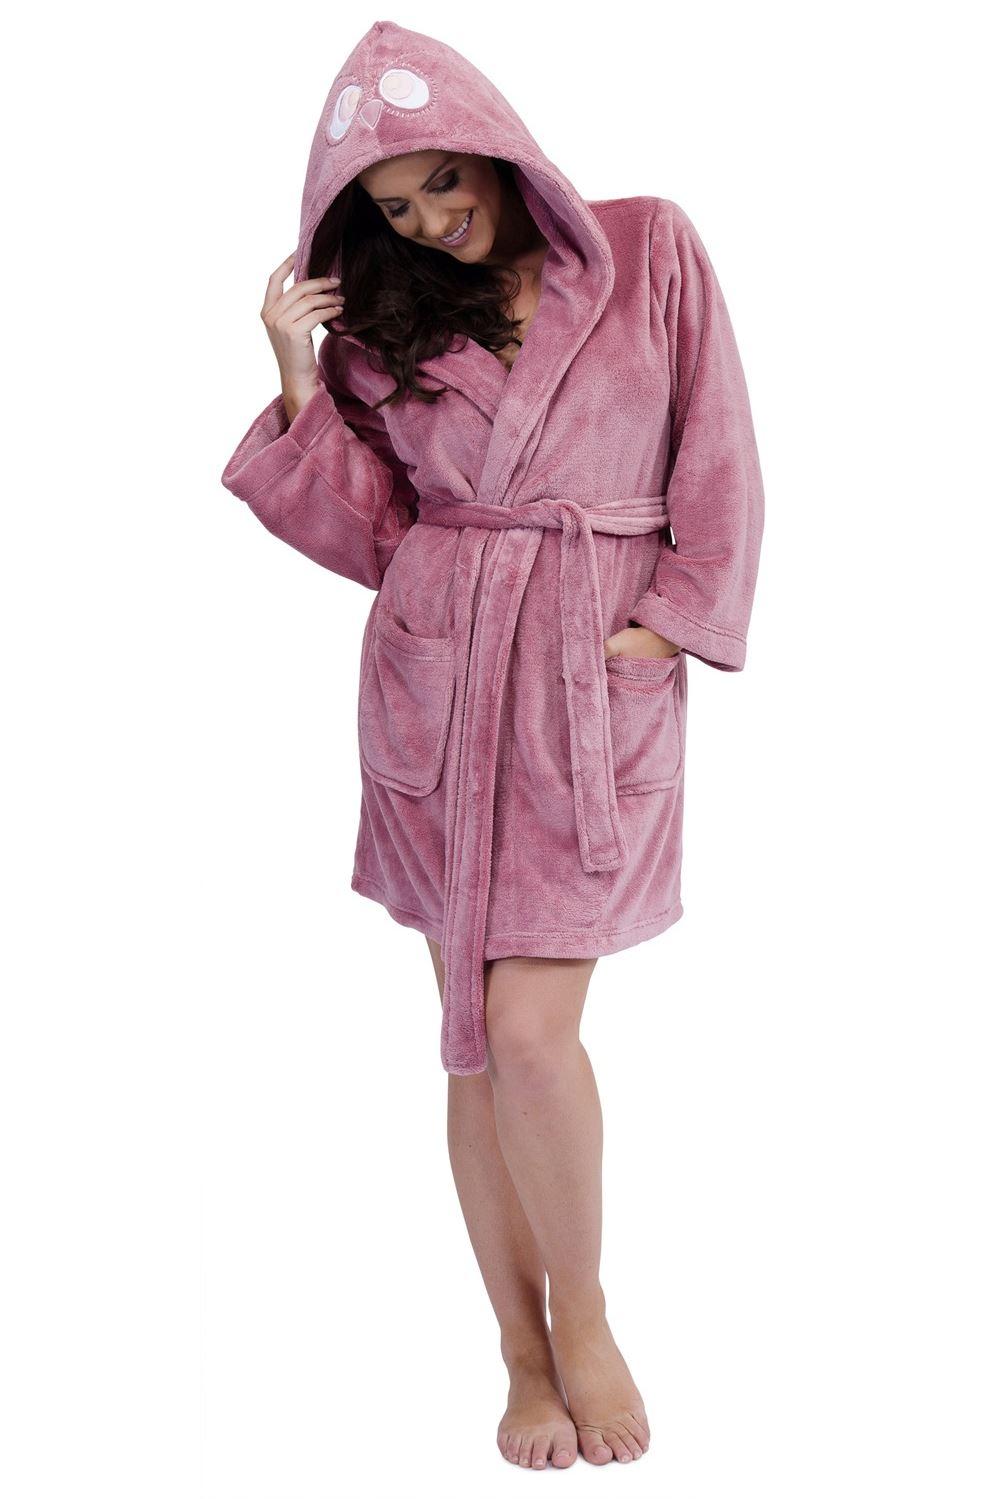 ladies fleece dressing gown soft hooded robe 10 12 14 16 18 20 ebay. Black Bedroom Furniture Sets. Home Design Ideas